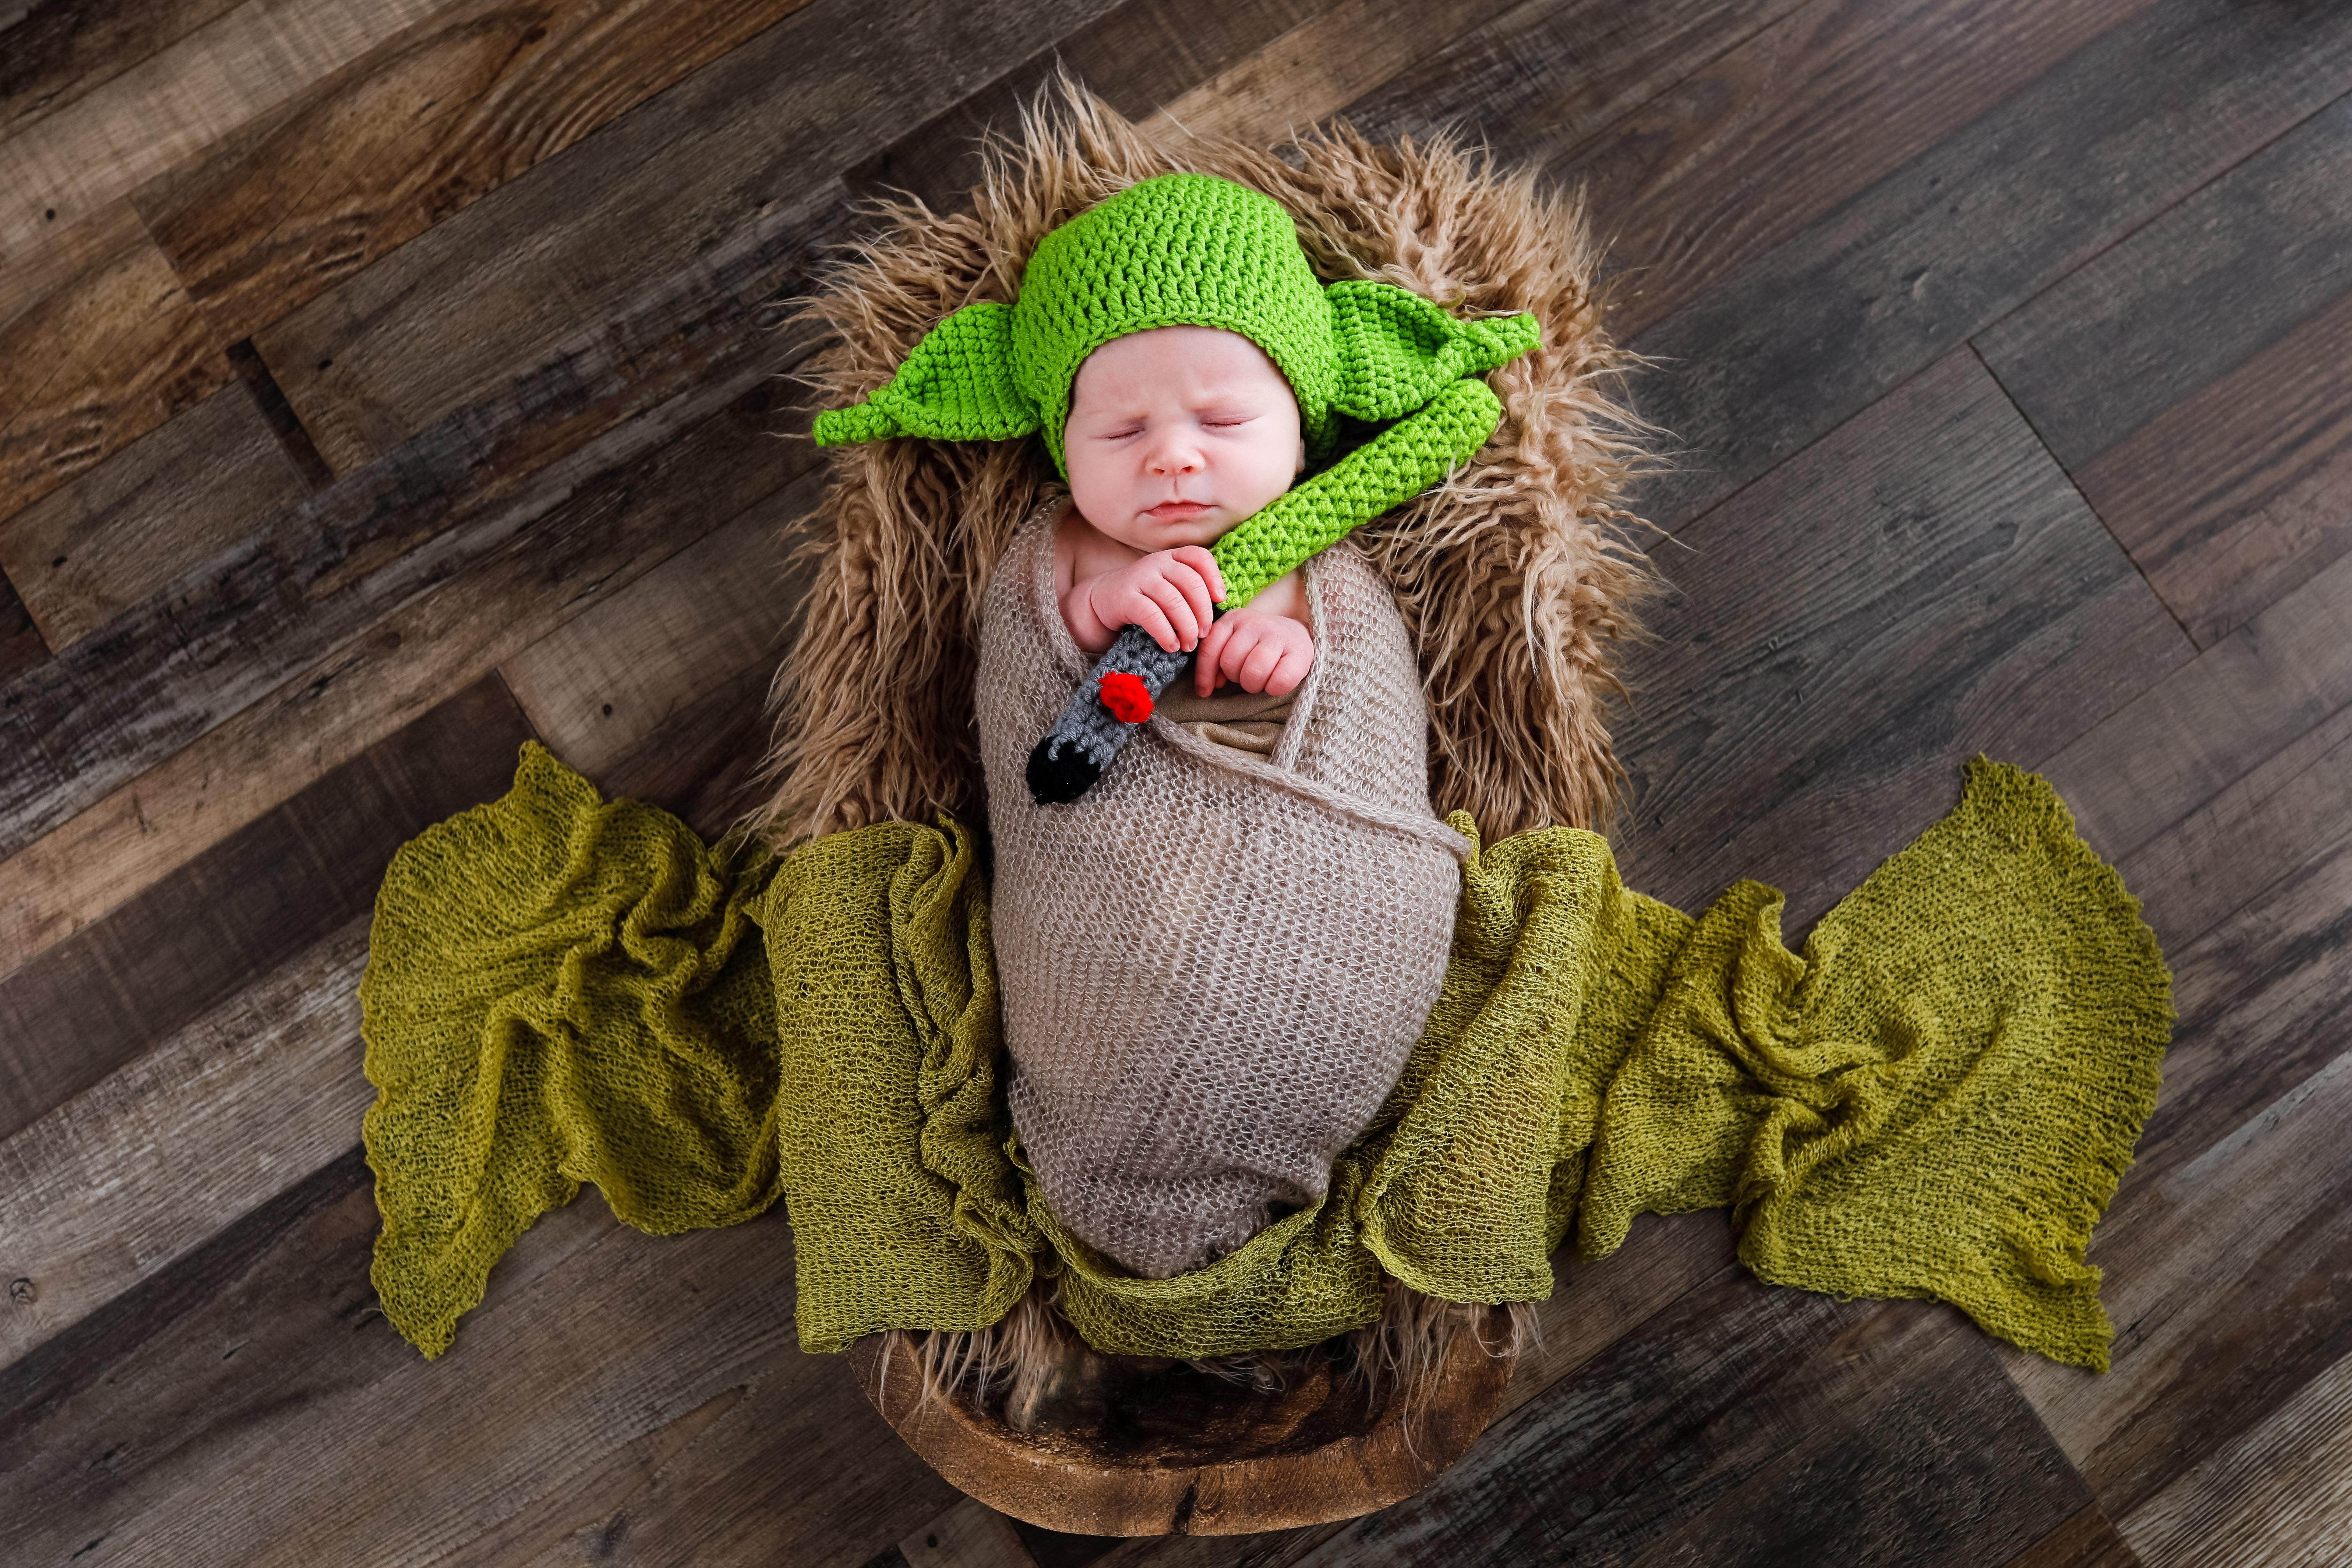 Becci Hethcoat Photography-Newborn Session Photographer-Wheaton--31